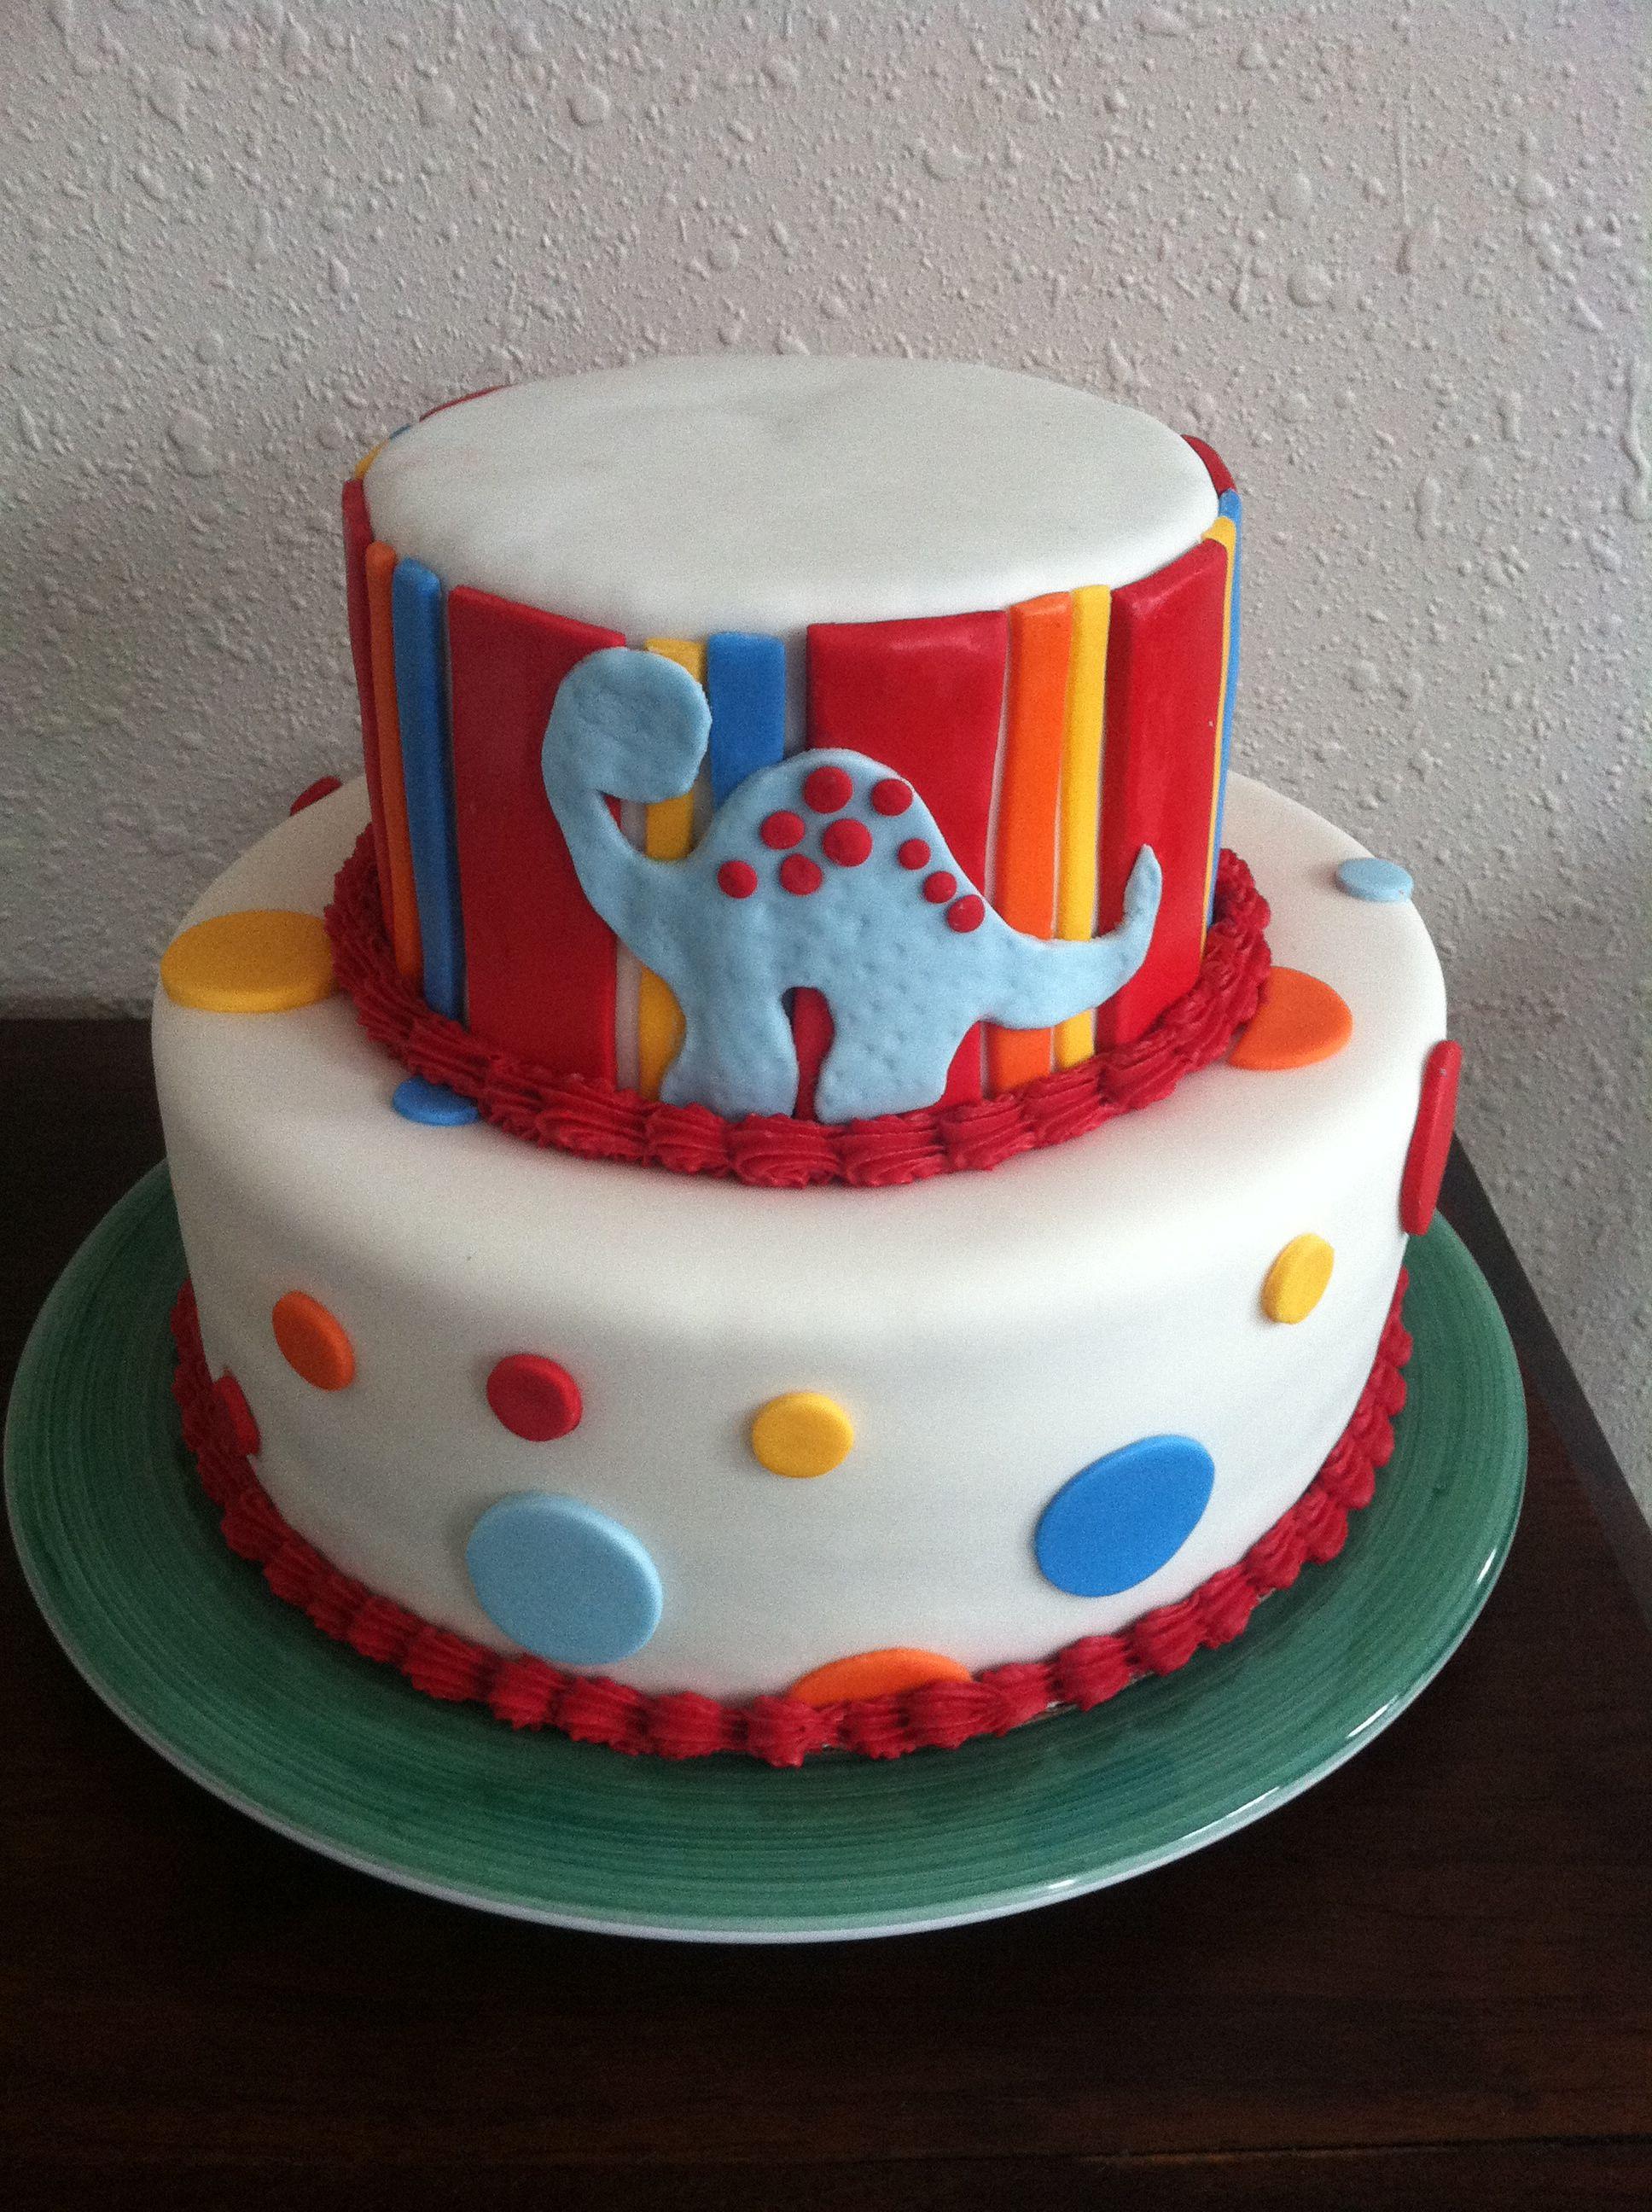 A cute dinosaur cake for a baby boy shower.